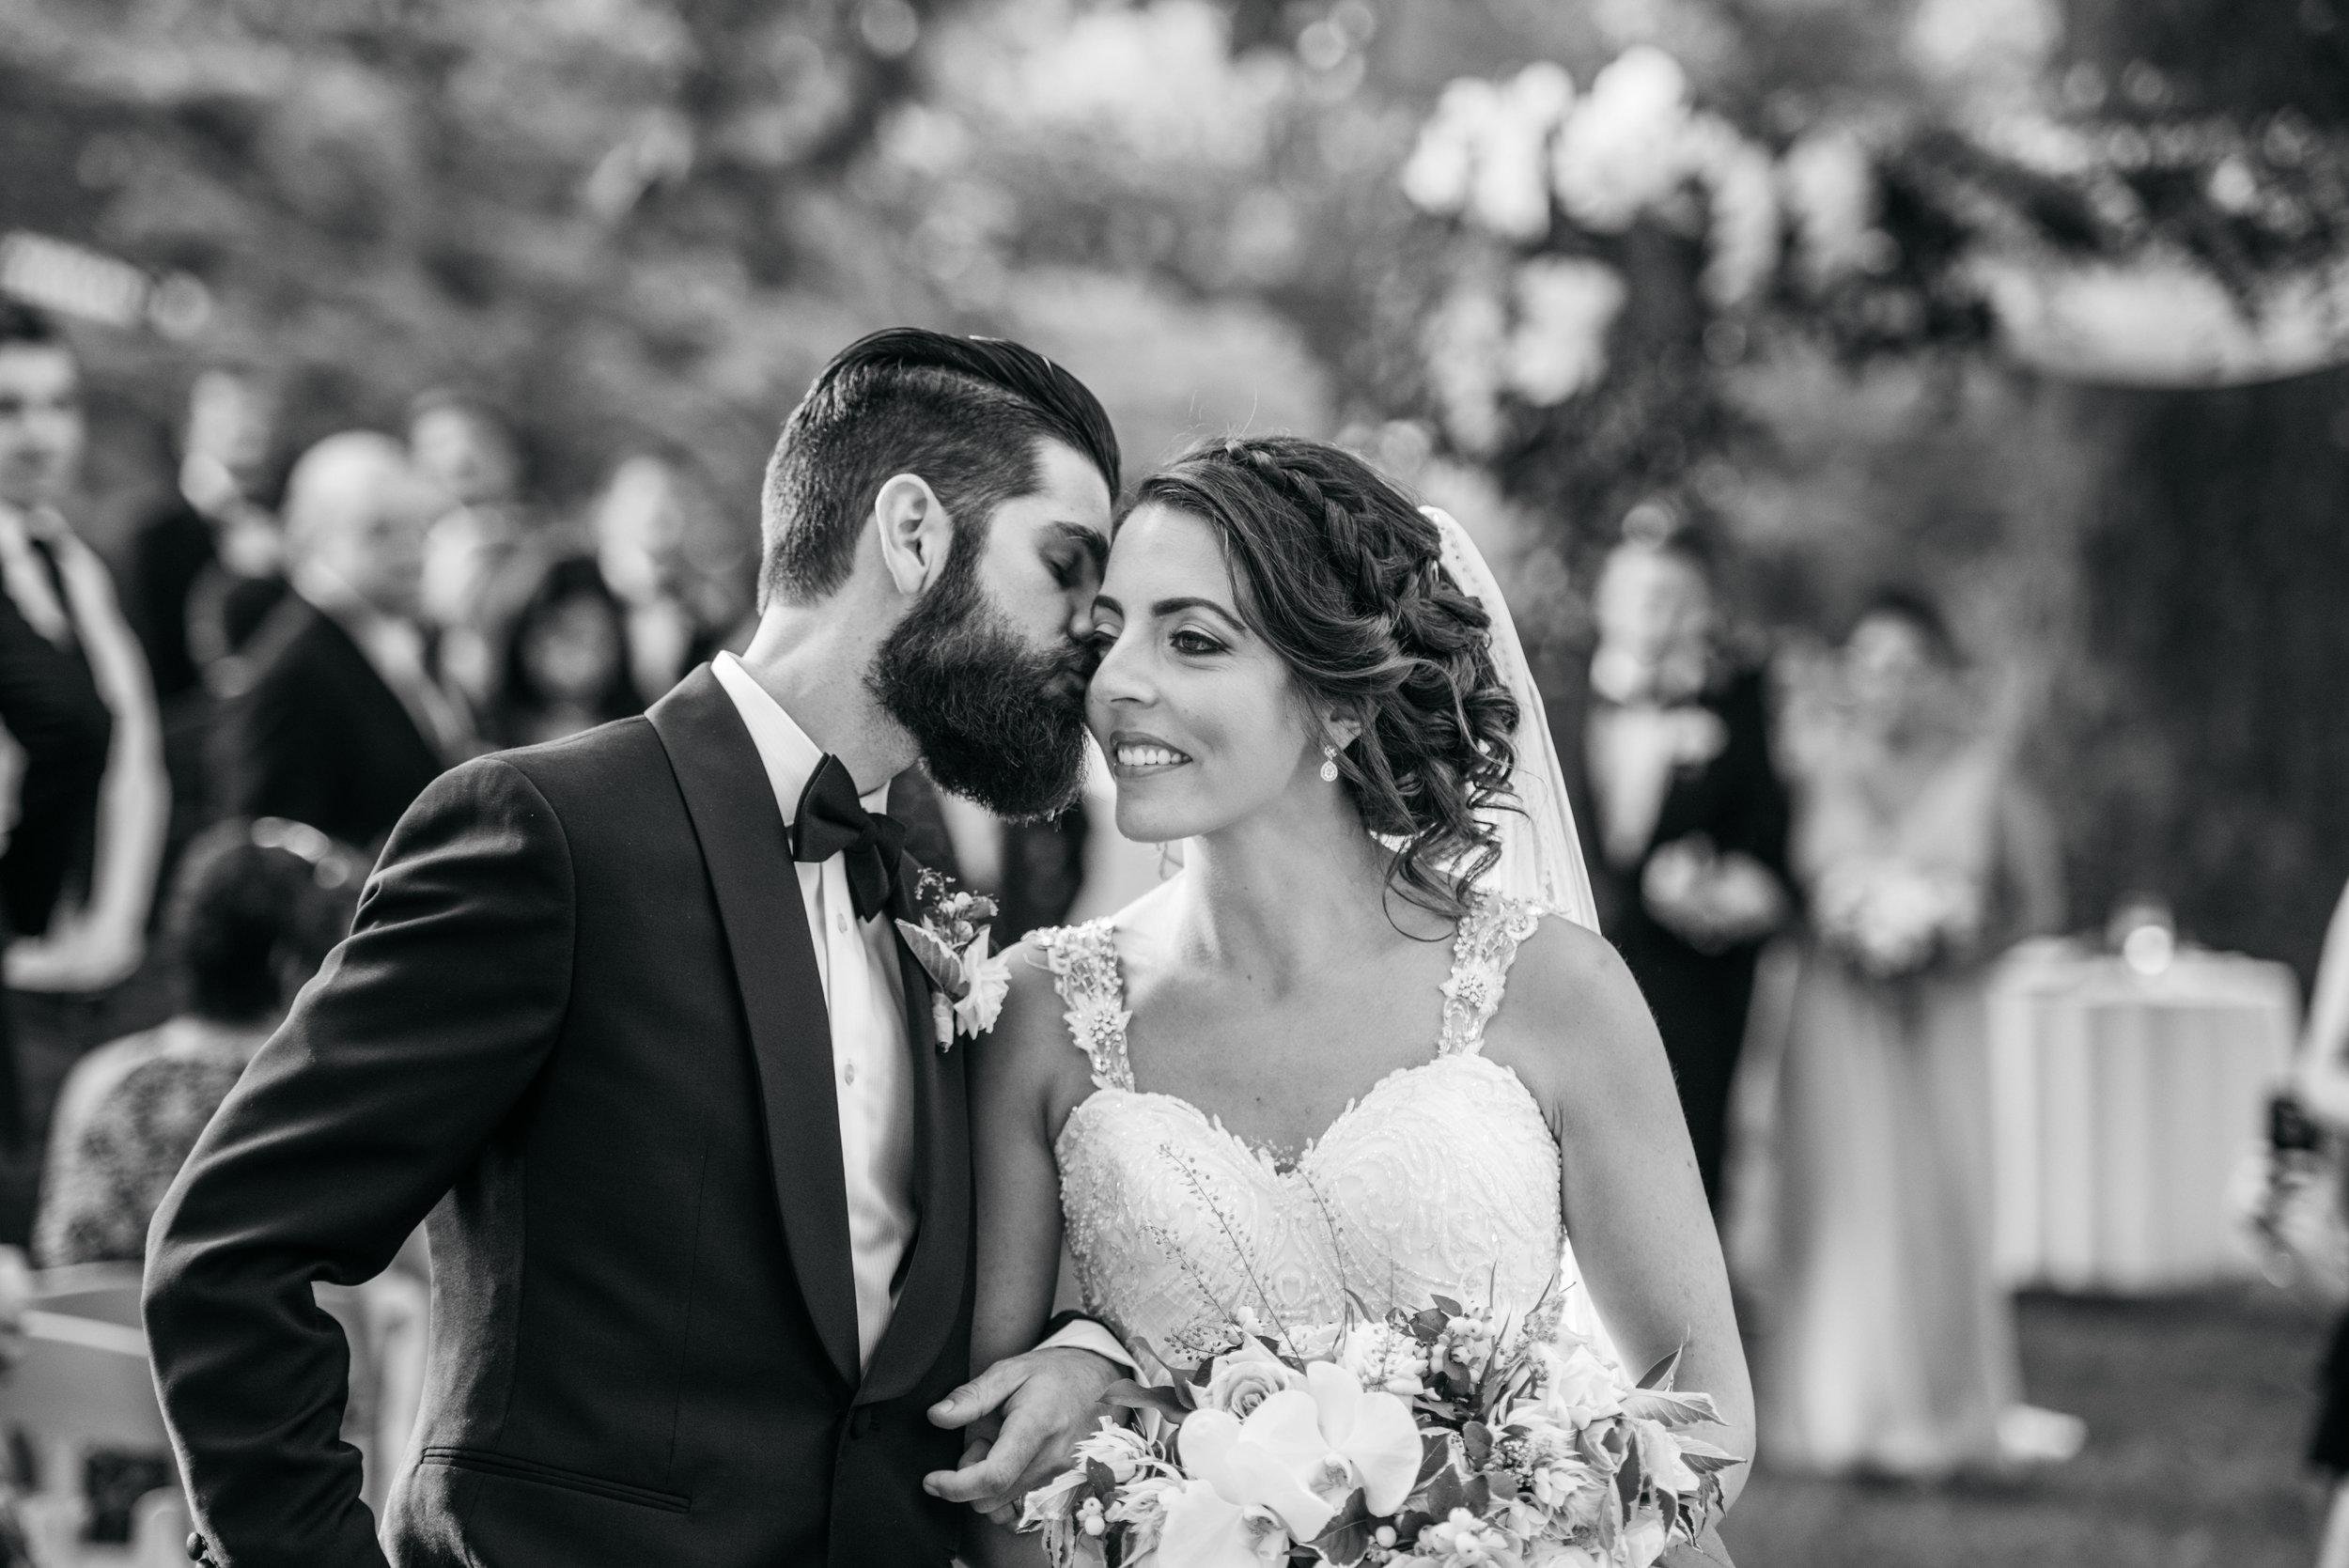 WeddingPhotos | NJPhotographer | Highlights-15.jpg